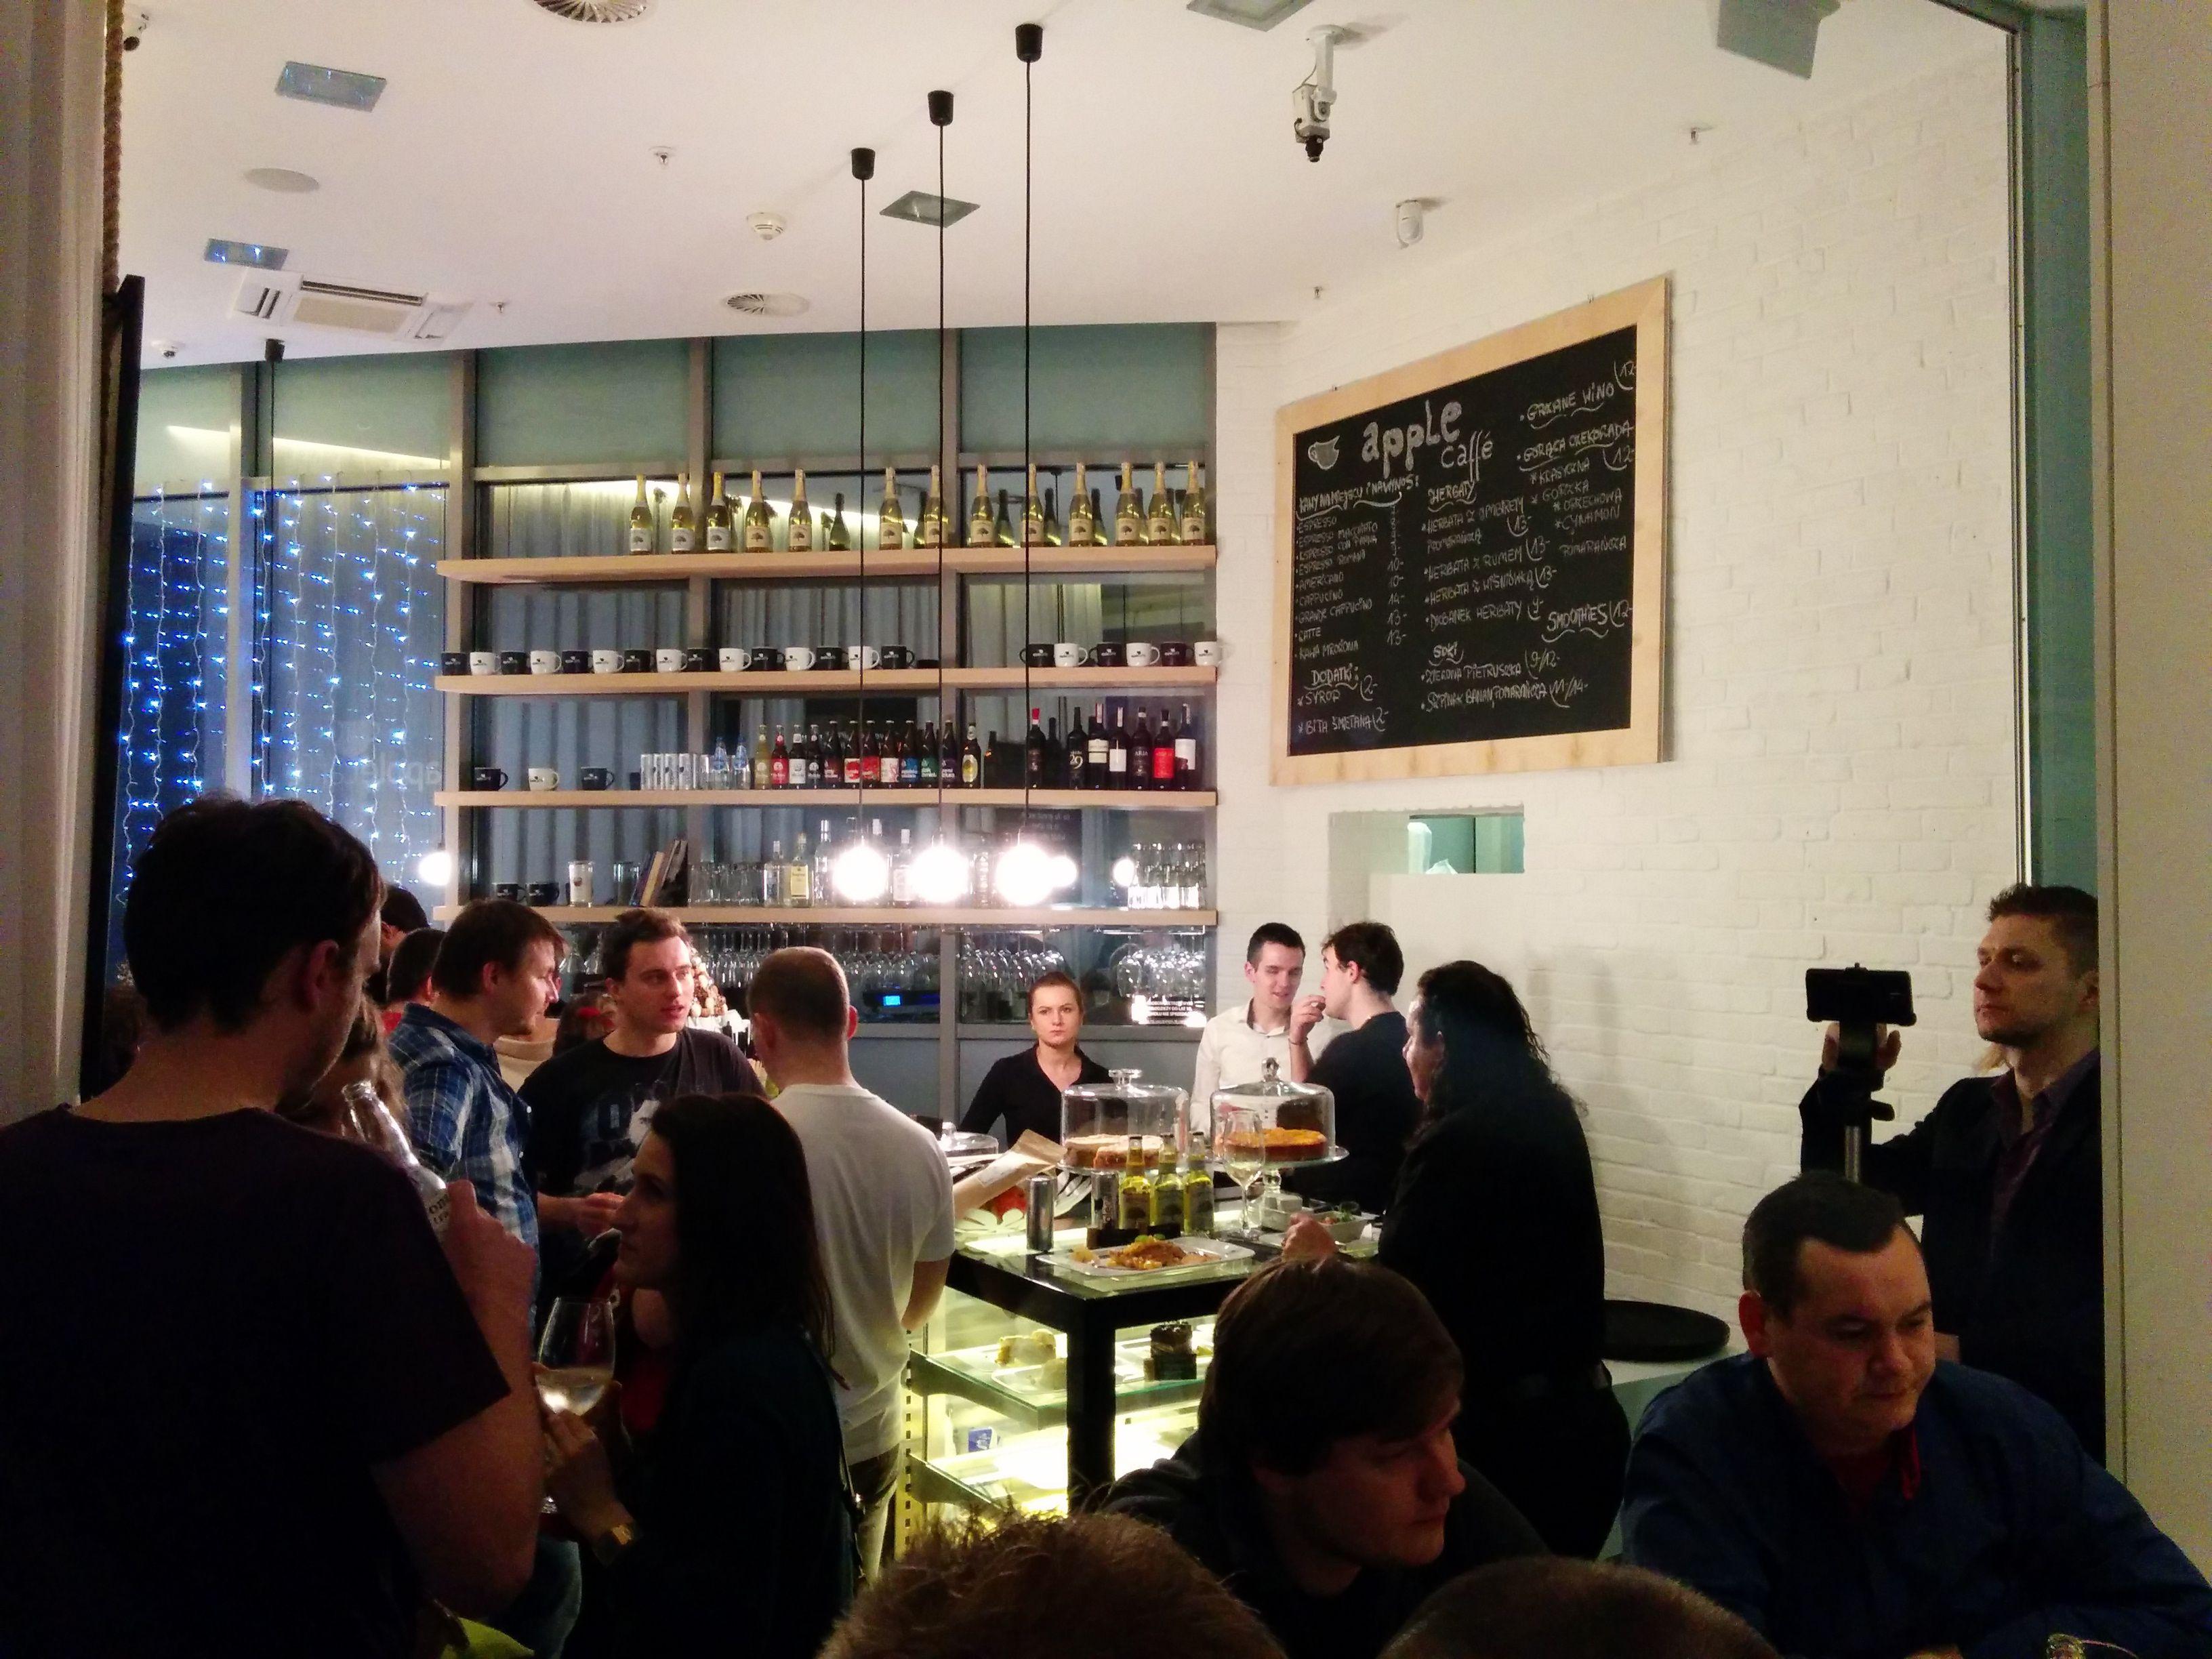 Warsaw Bitcoin Meetup Group